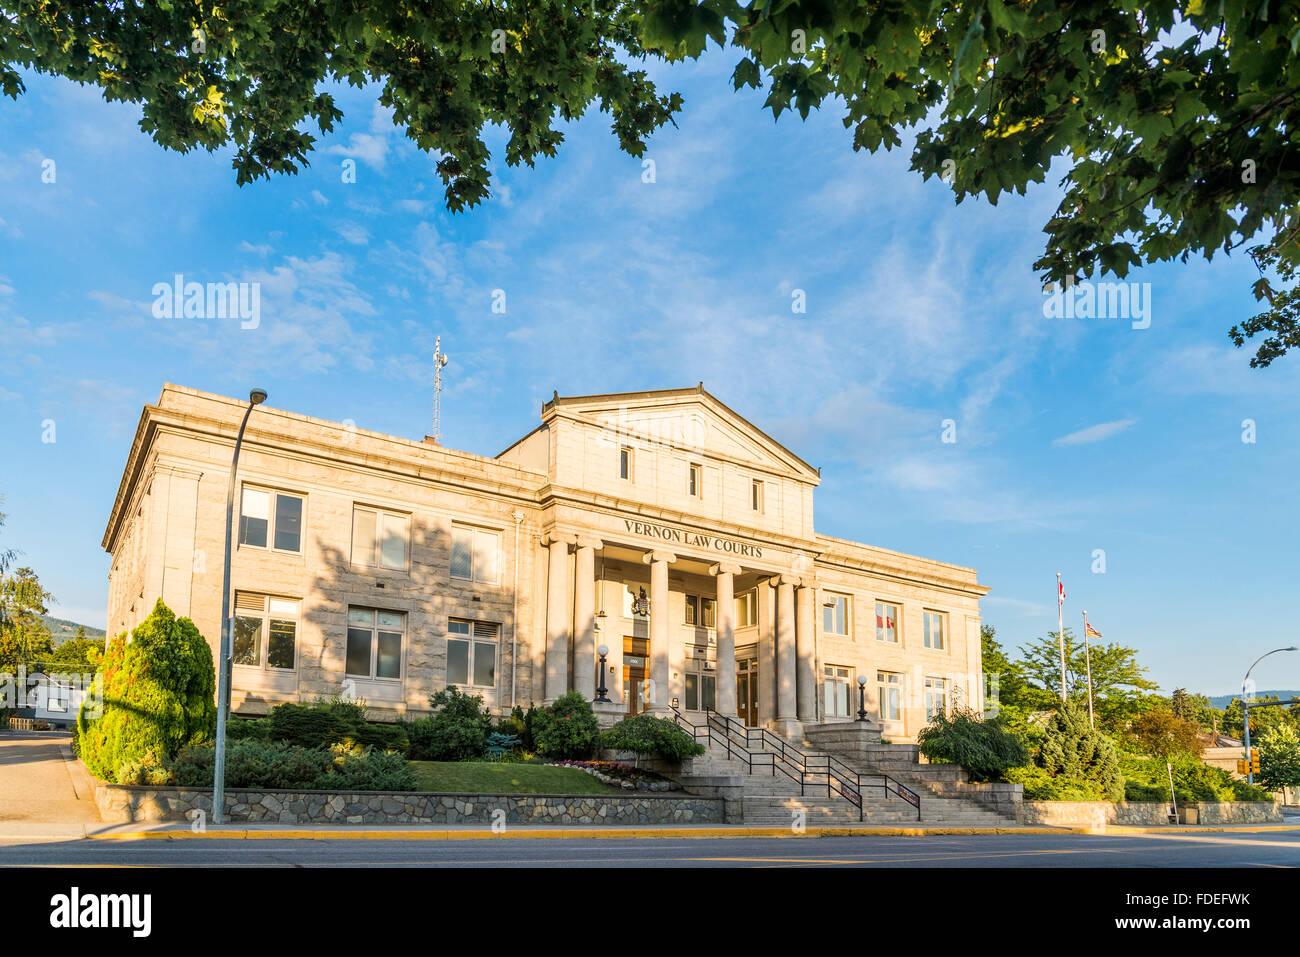 Law Courts,  Vernon, British Columbia, Canada - Stock Image